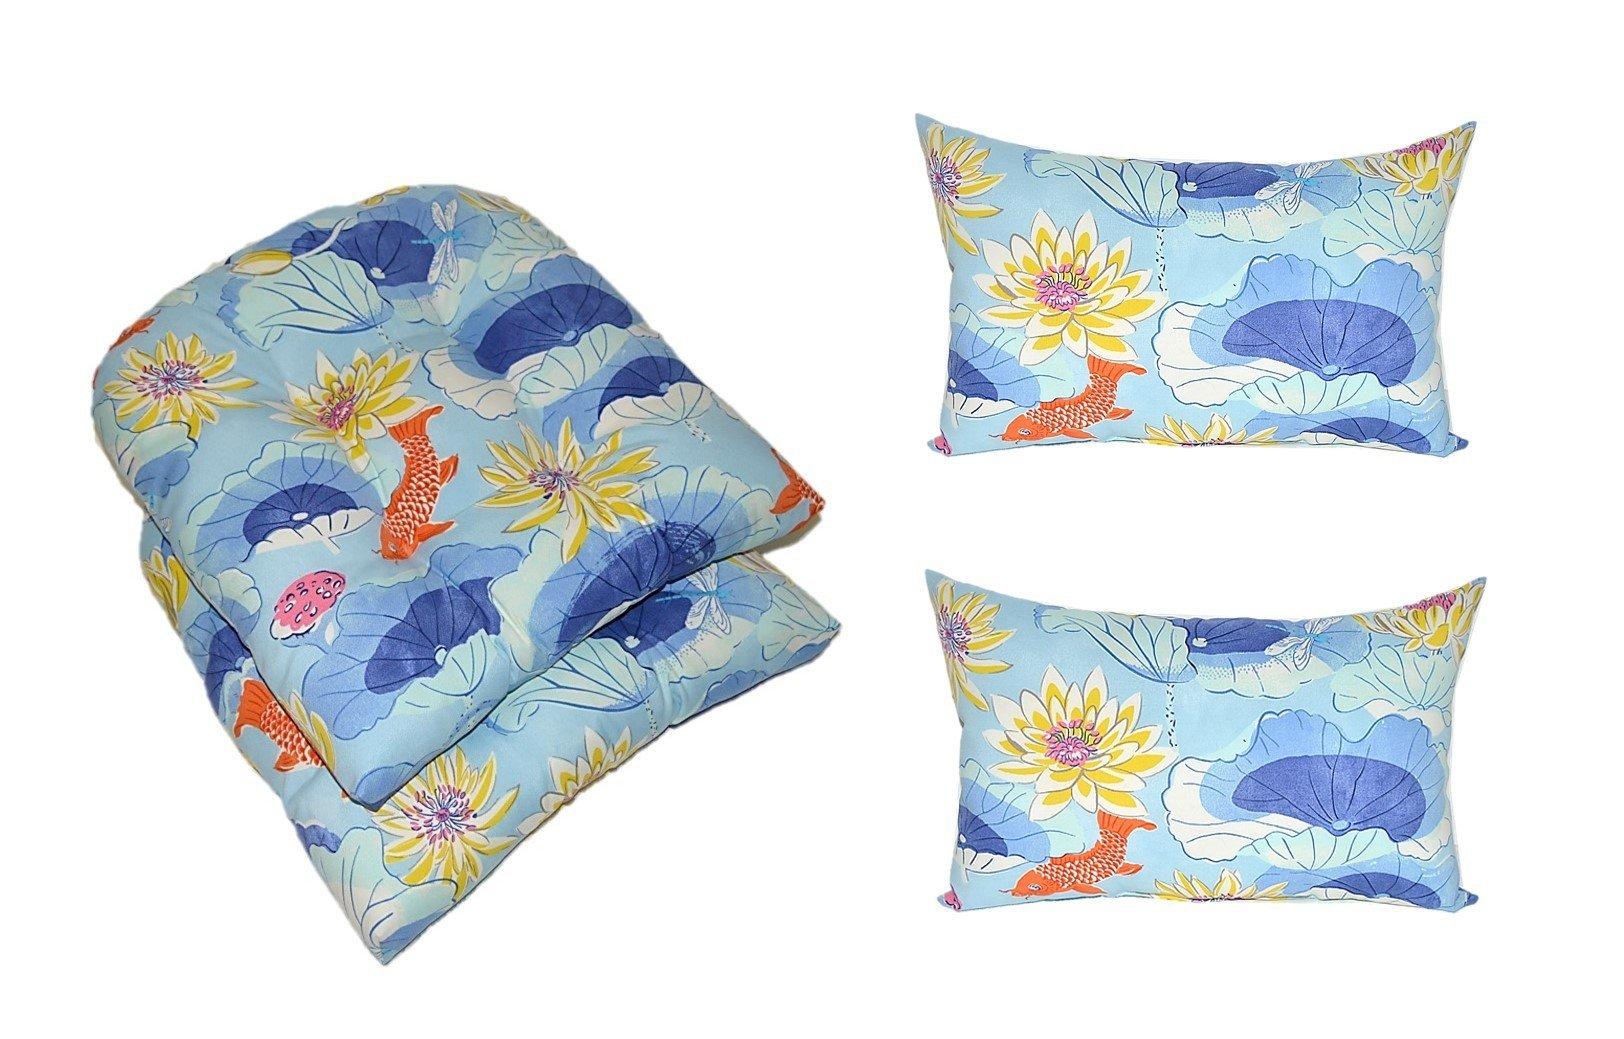 Set of 2 - Indoor / Outdoor Tufted U-shape Cushions for Wicker Chair Seats + 2 Free Rectangle / Lumbar Pillows - Lotus Lake Cobalt Koi Fish - Blue Orange Yellow